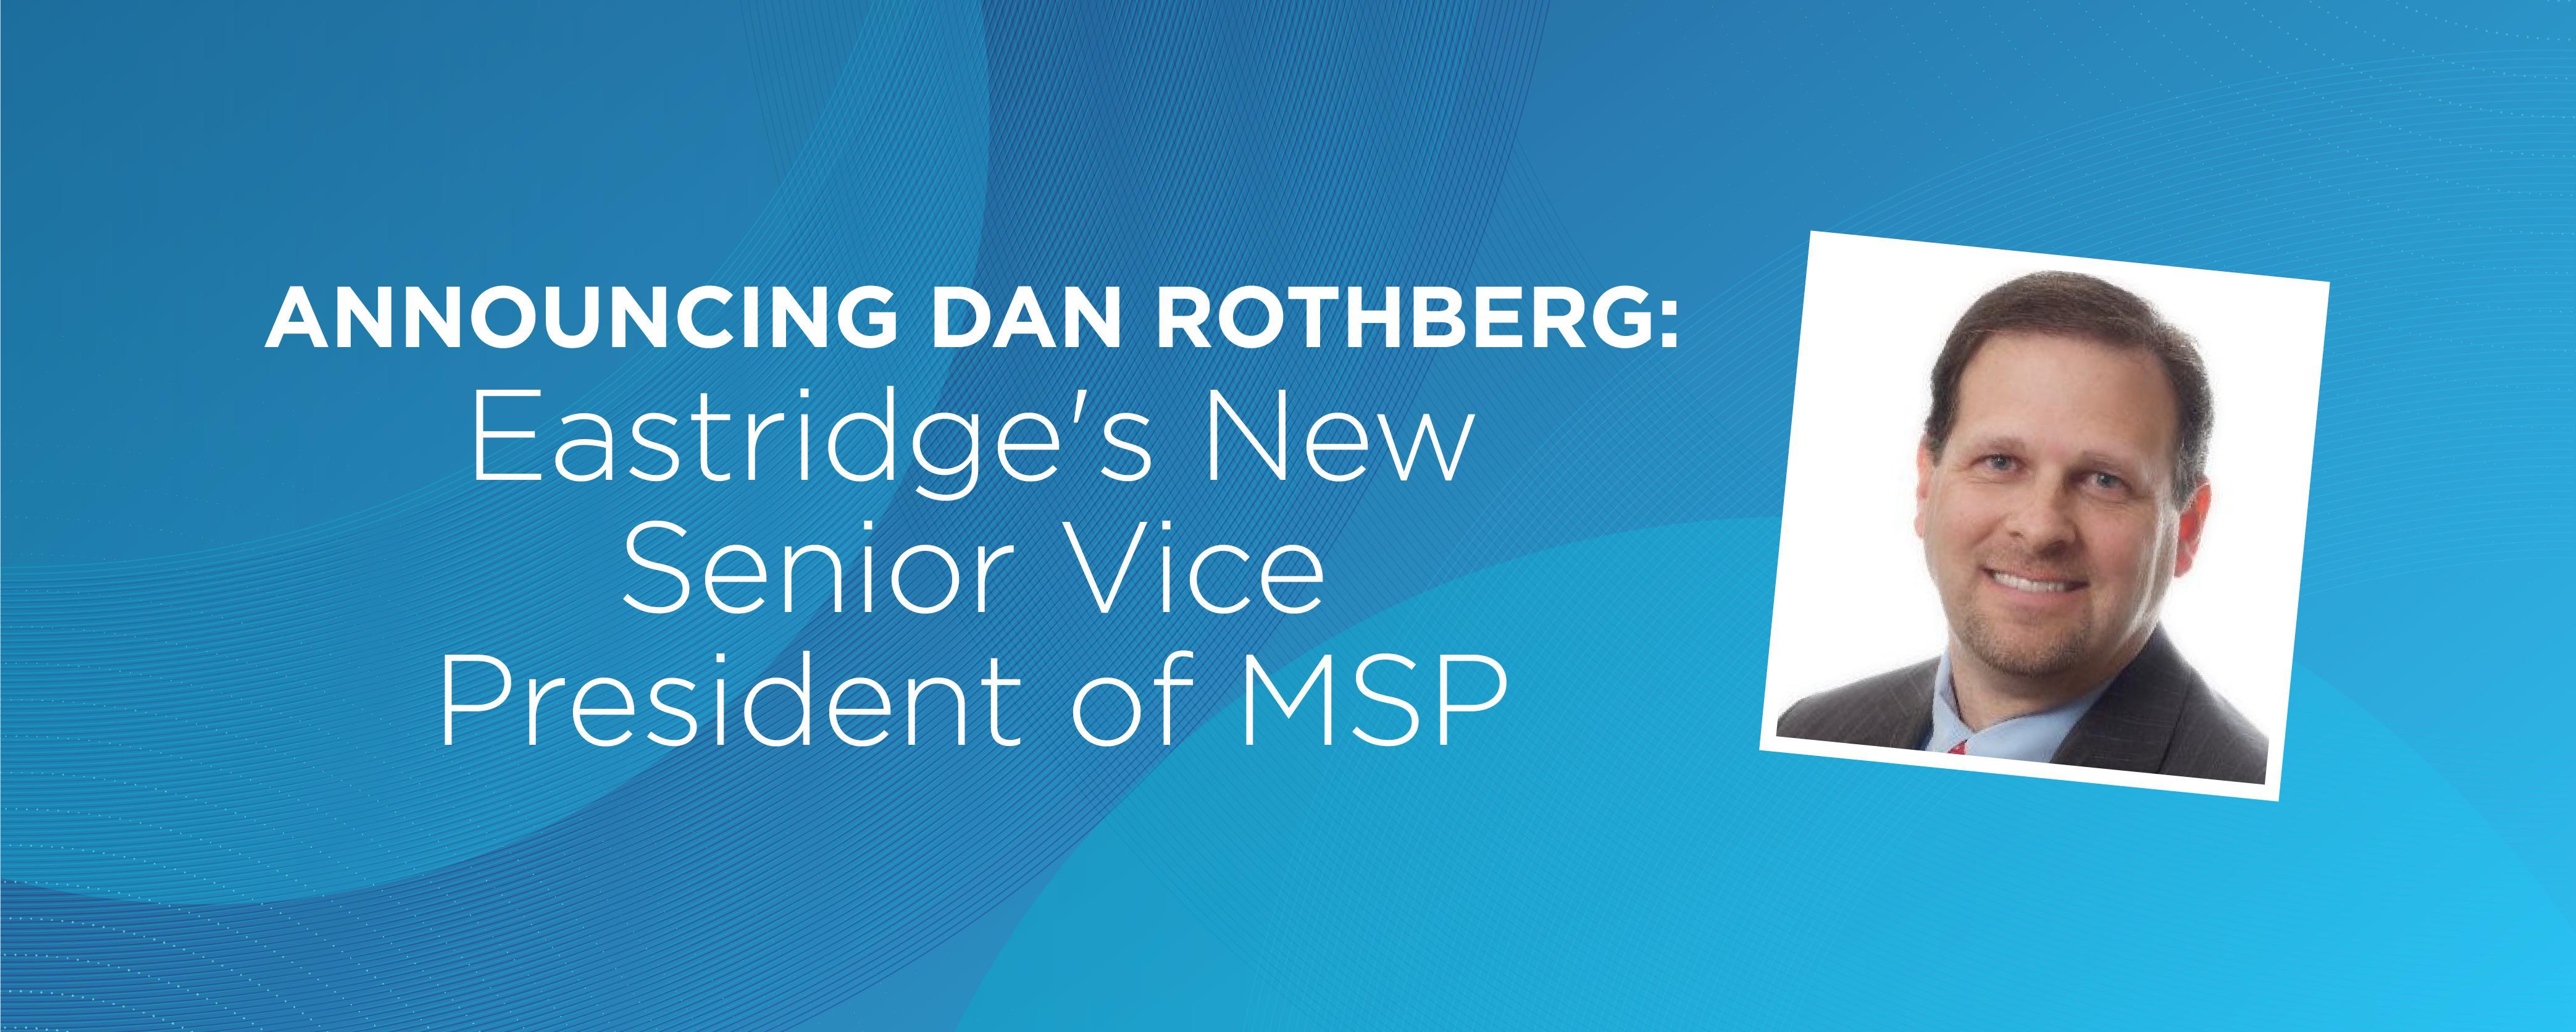 Dan Rothberg - Employee Spotlight